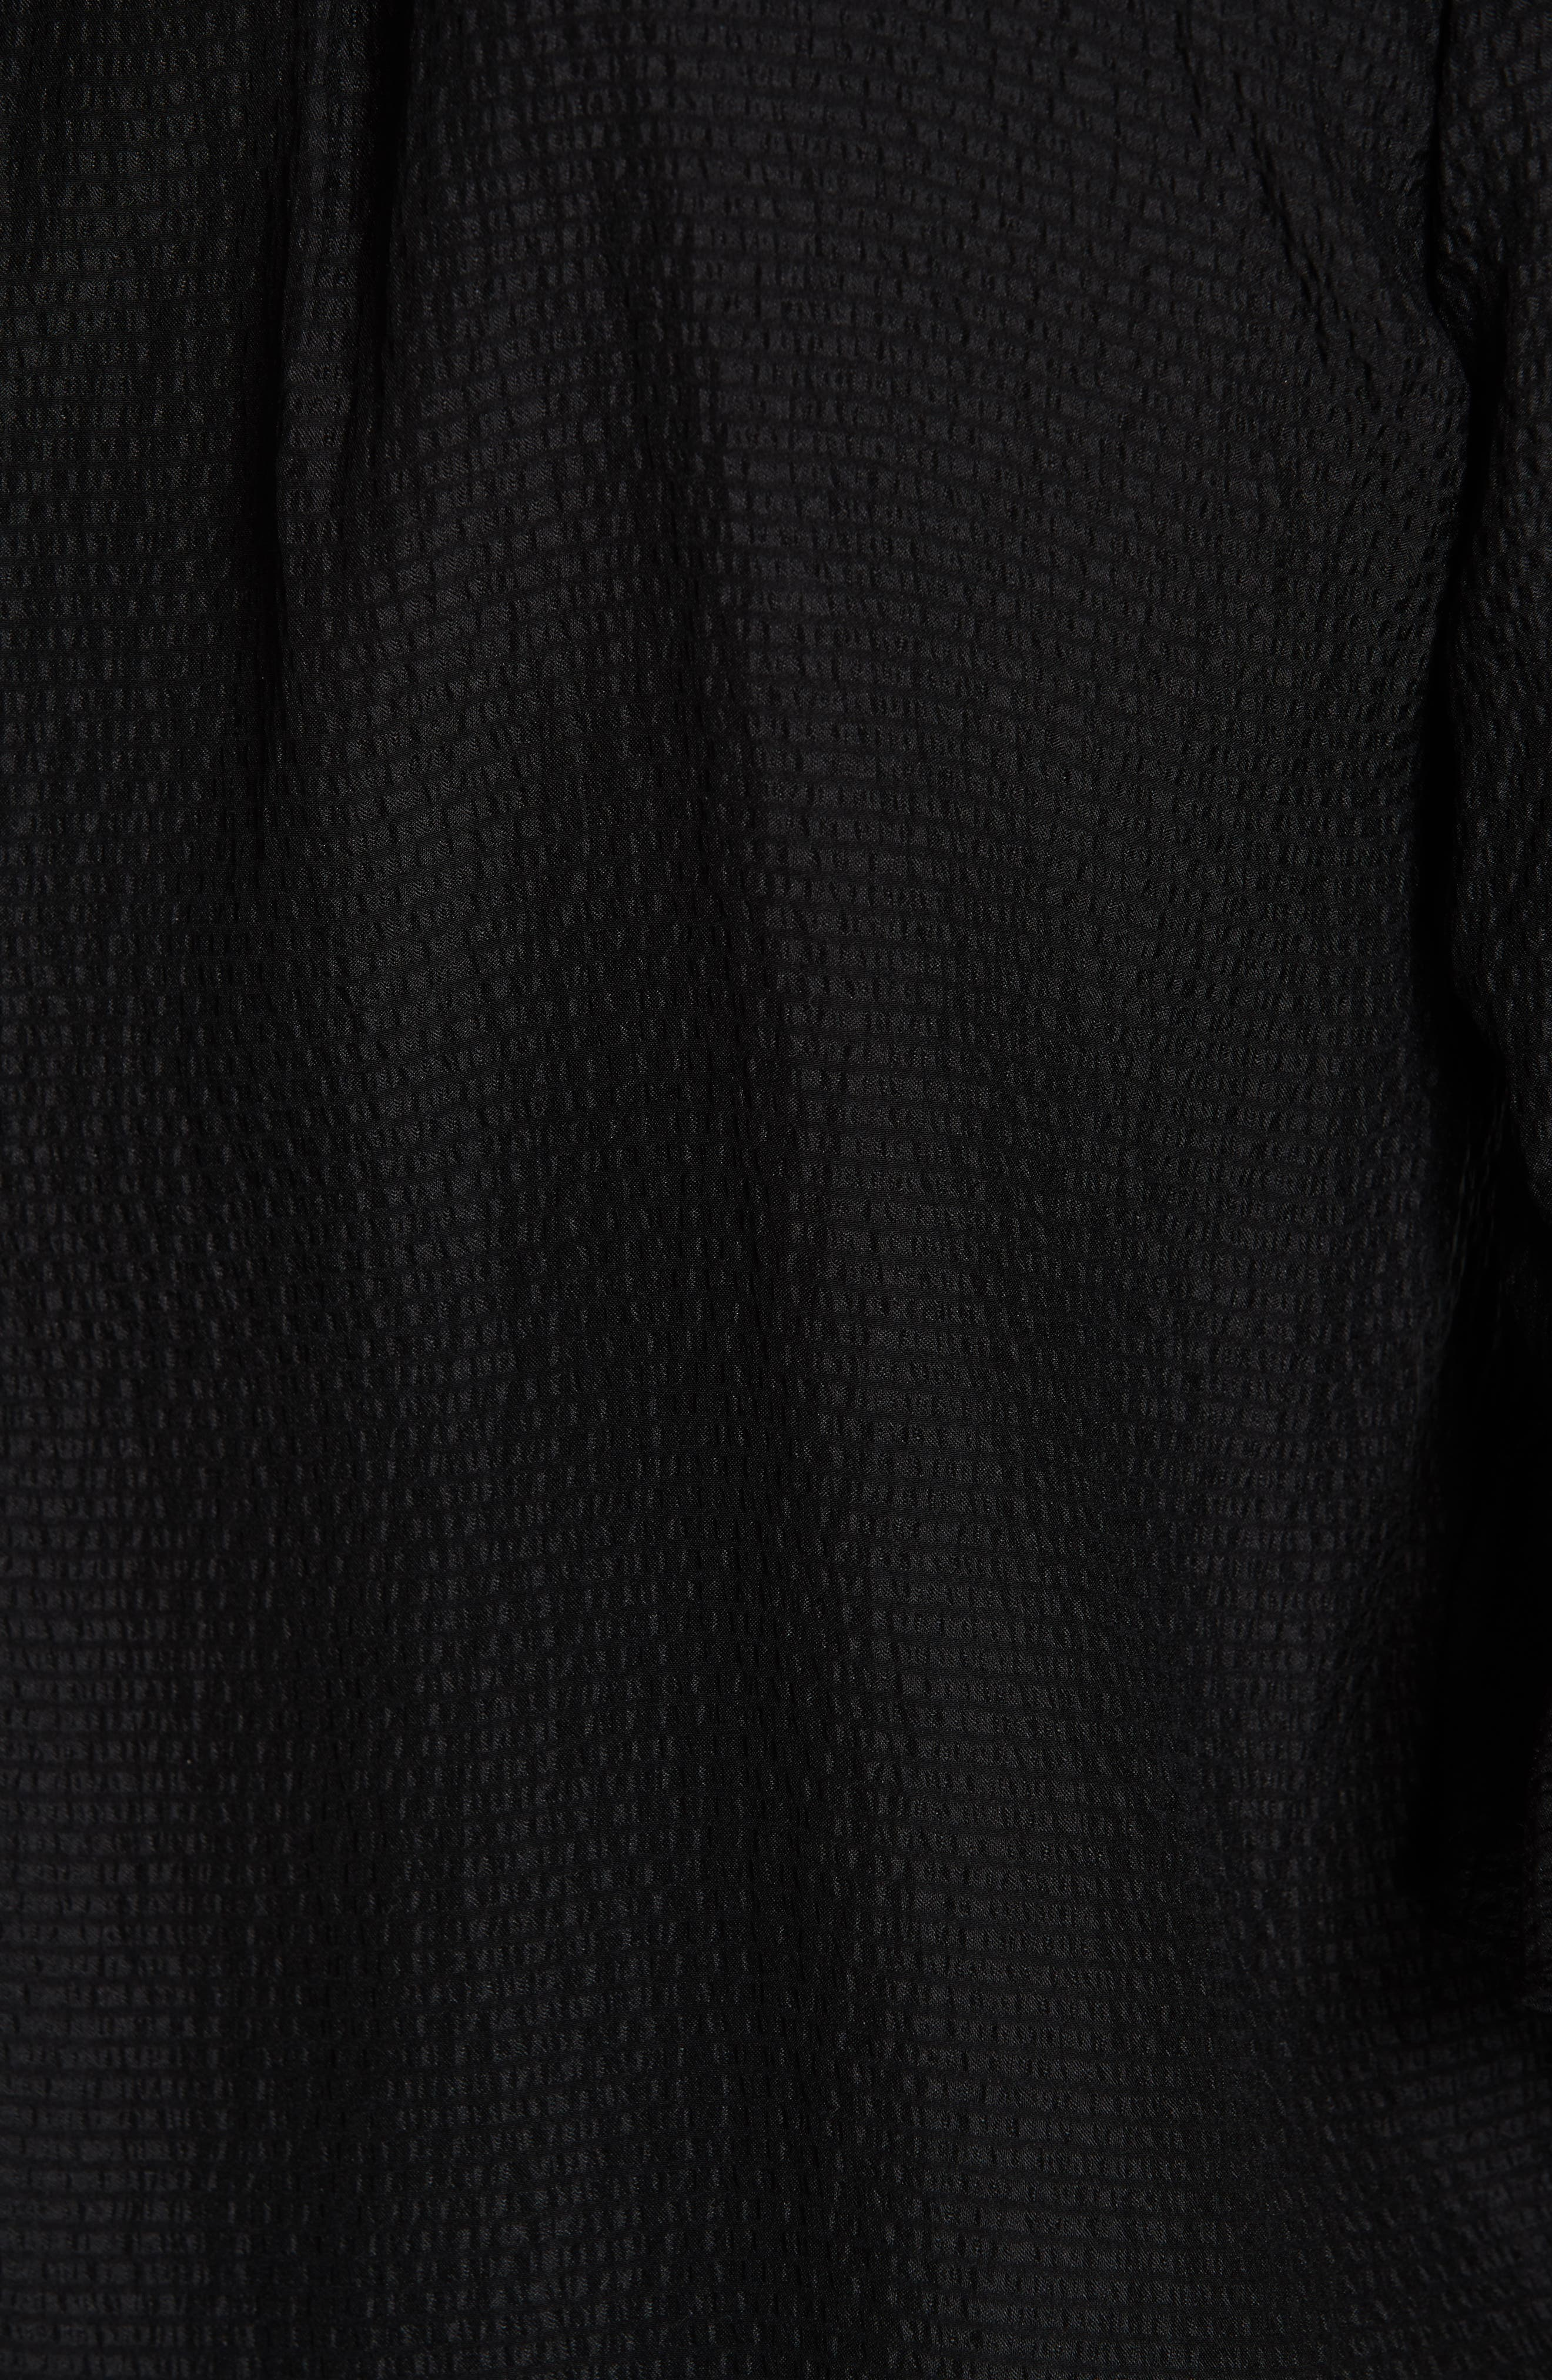 Silk Ruffle Top,                             Alternate thumbnail 5, color,                             BLACK